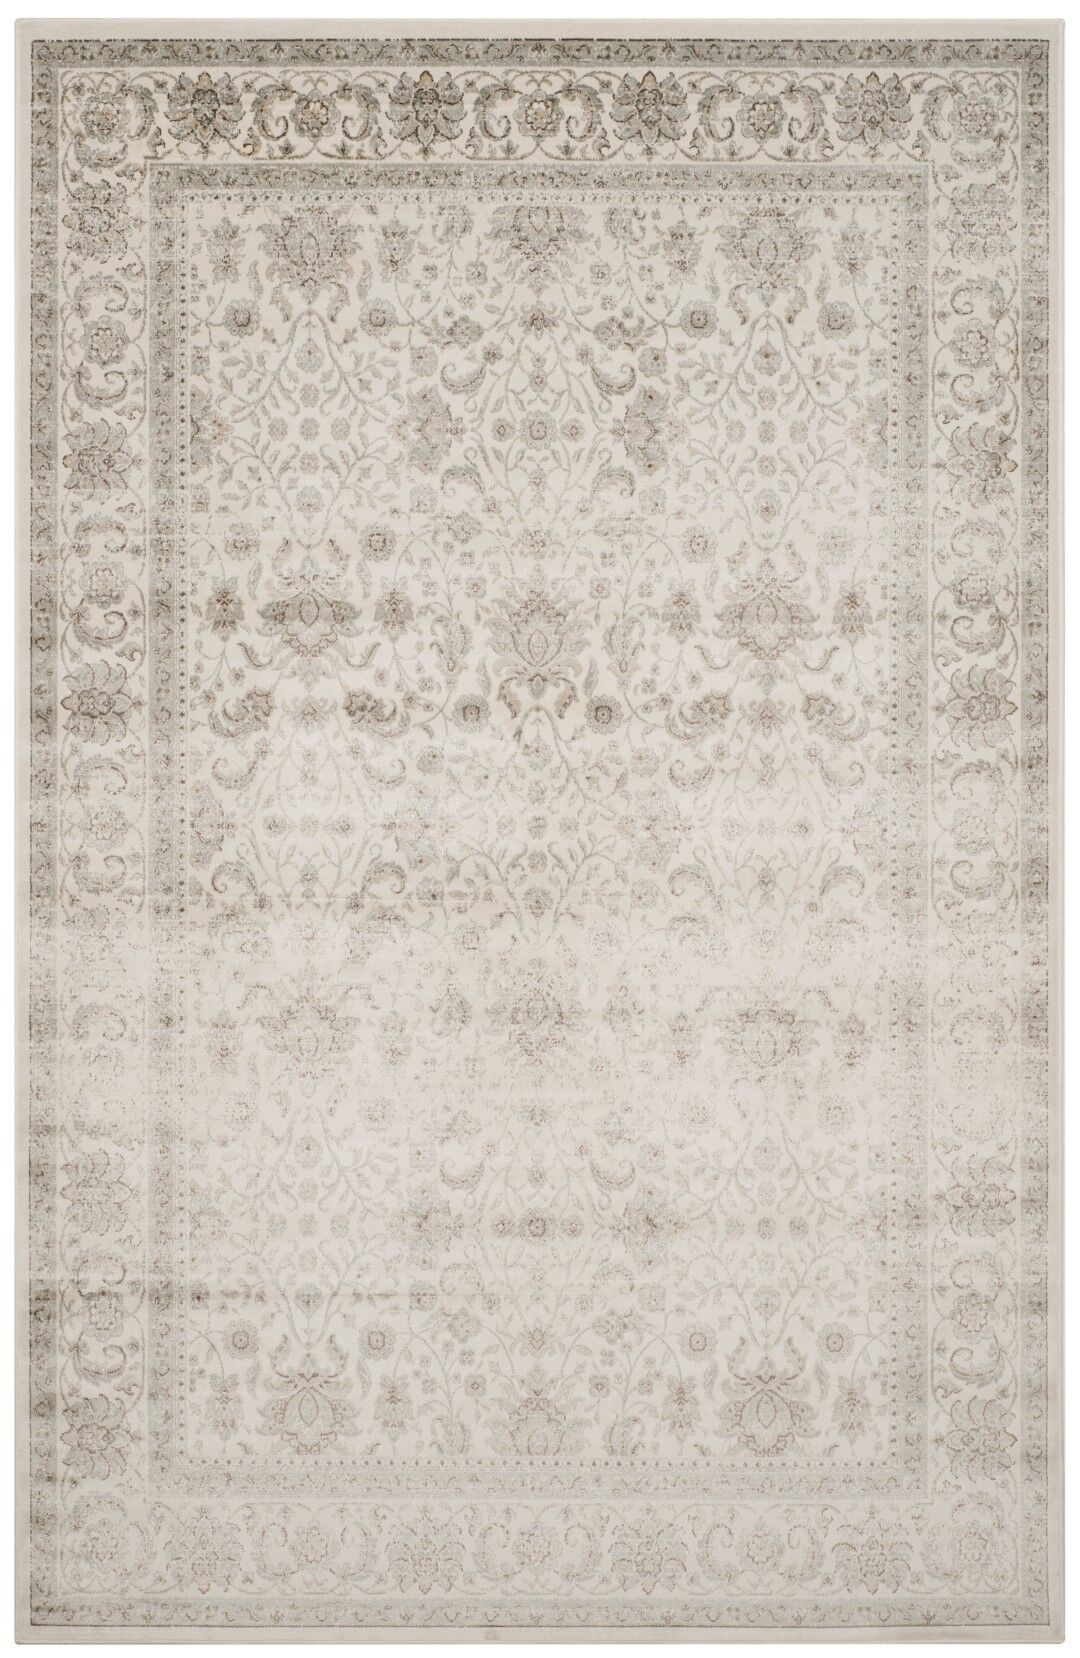 Setser Ivory/Silver Area Rug Rug Size: Rectangle 6'7